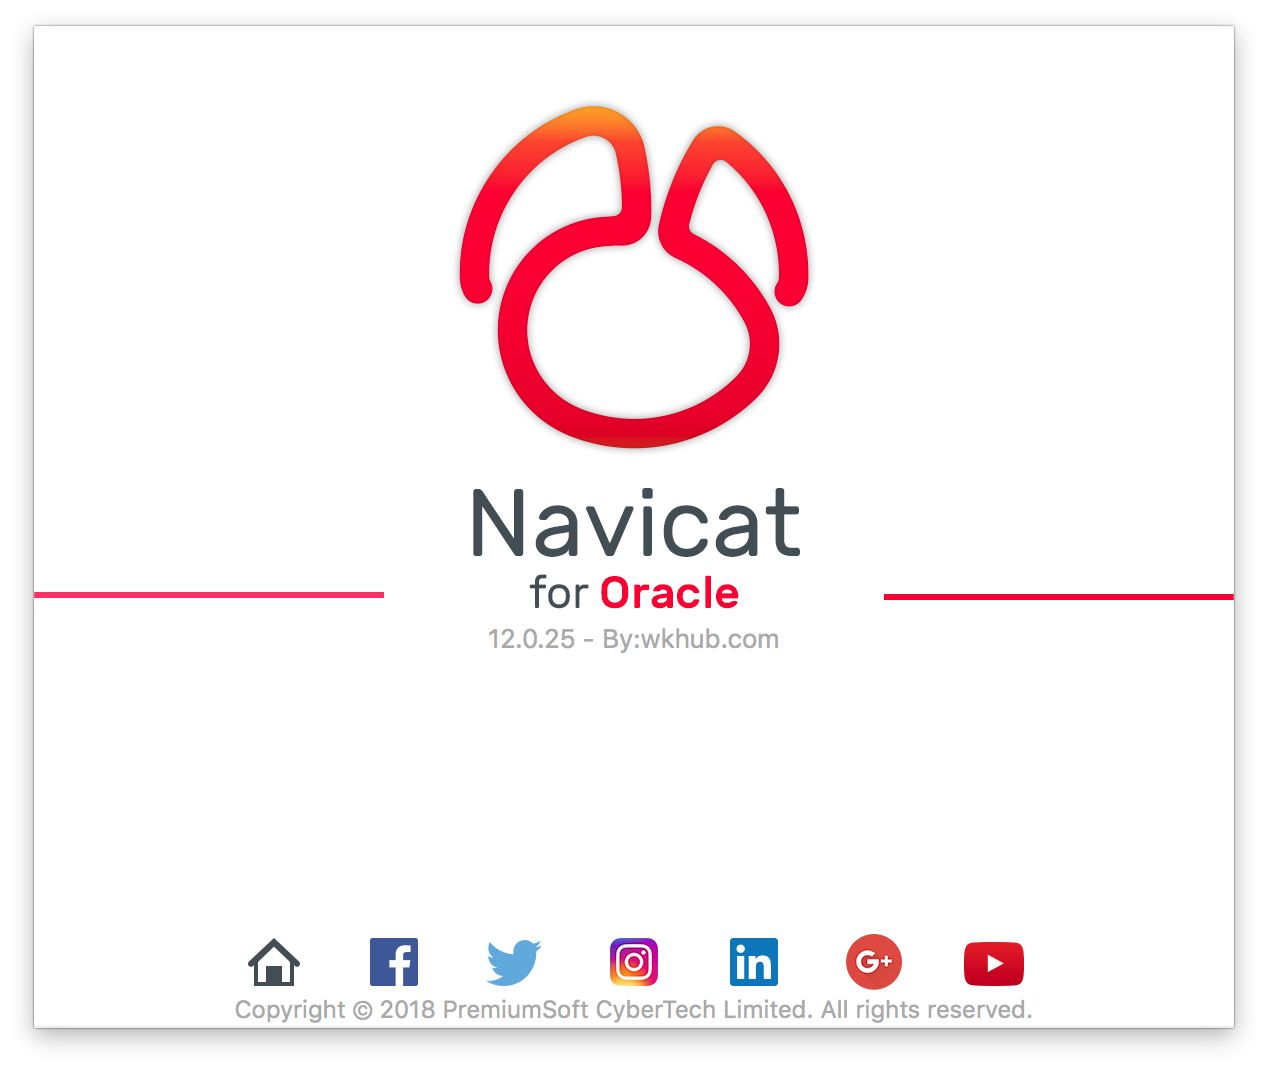 Navicat for Oracle 12.0.25 图形化 Oracle 数据库管理工具